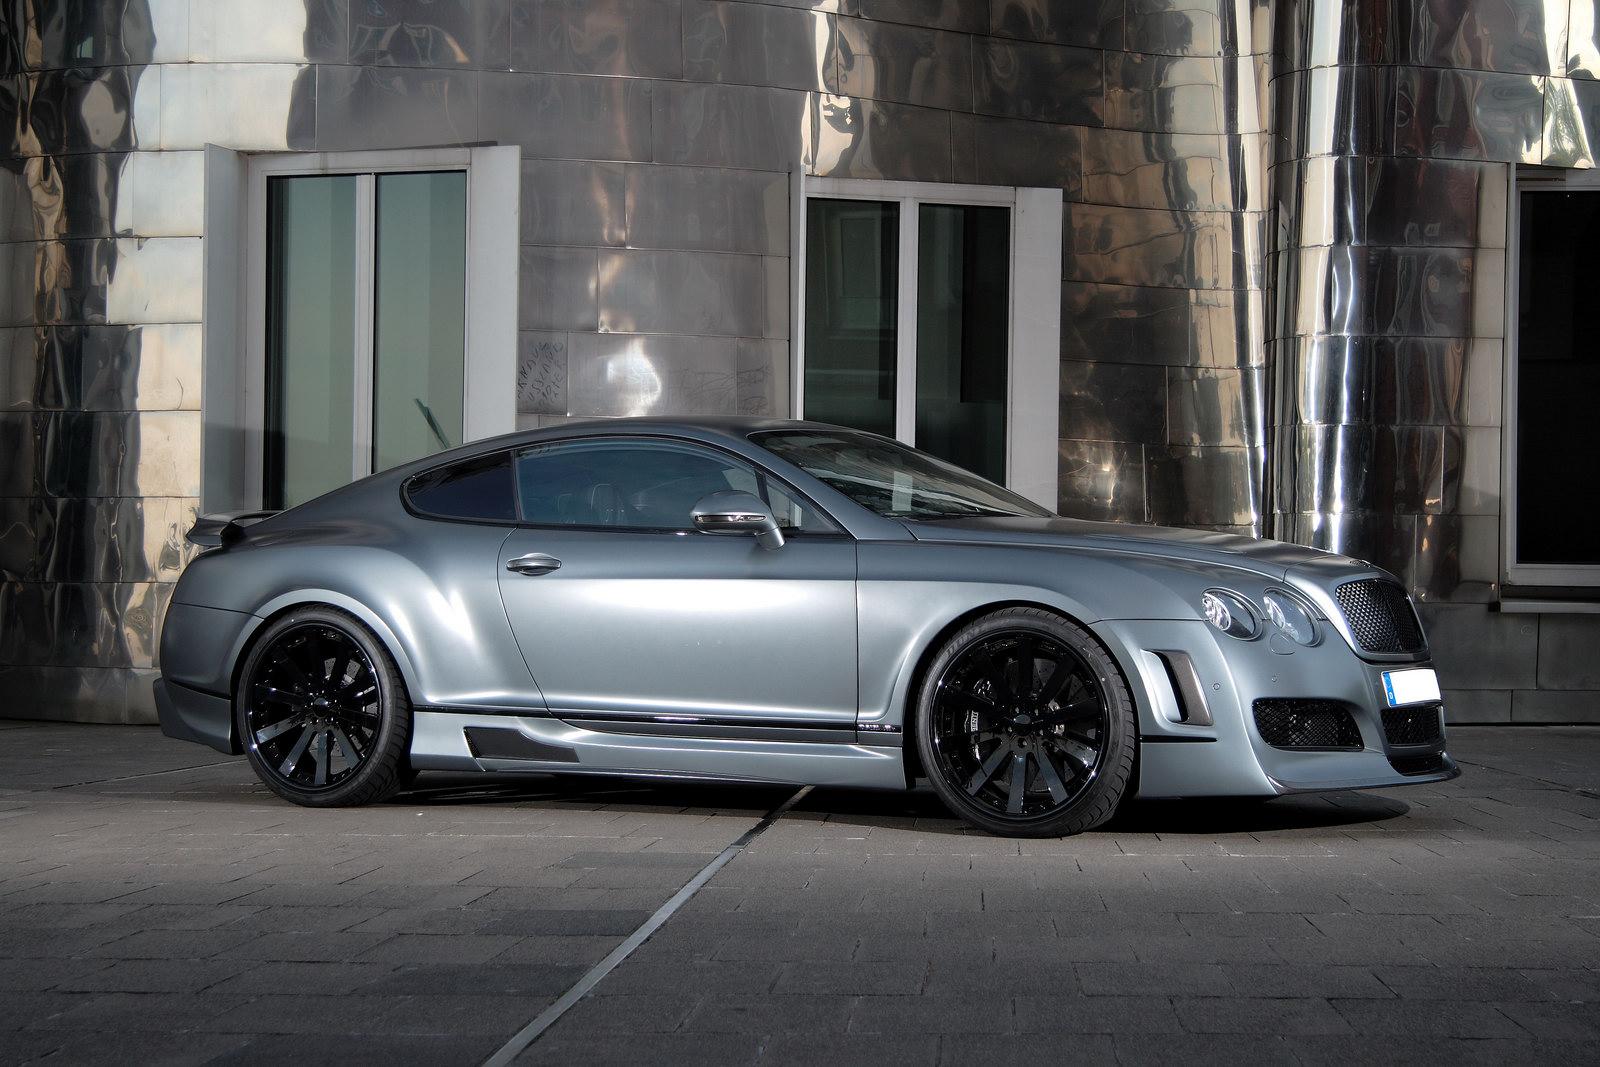 Tuning Cars And News Bentley Continental Custom